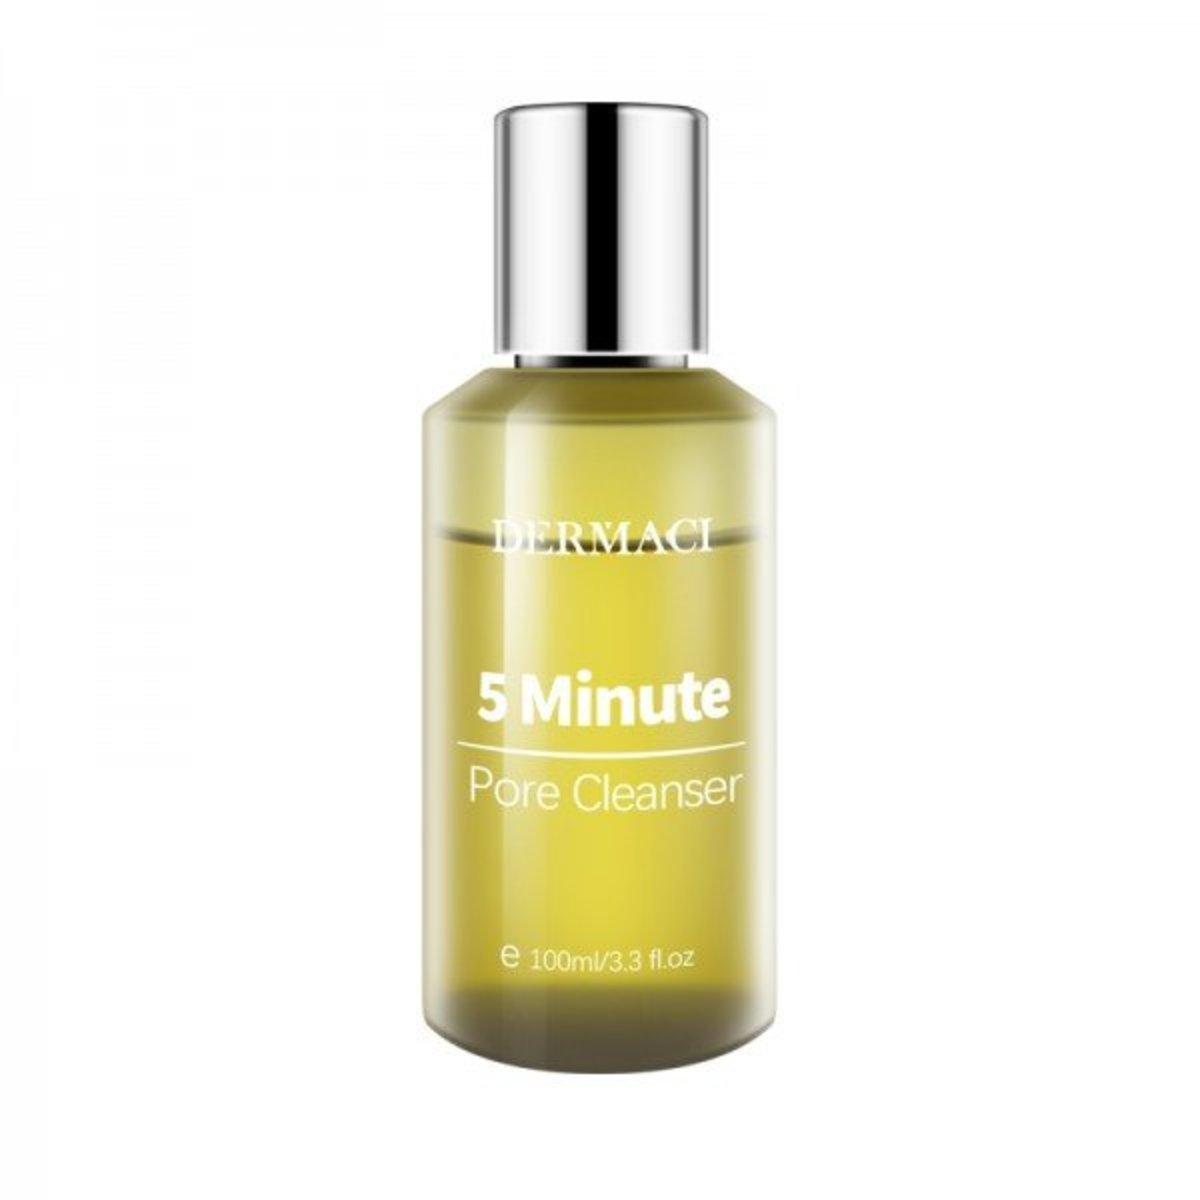 5 Minute Pore Cleanser 100ml